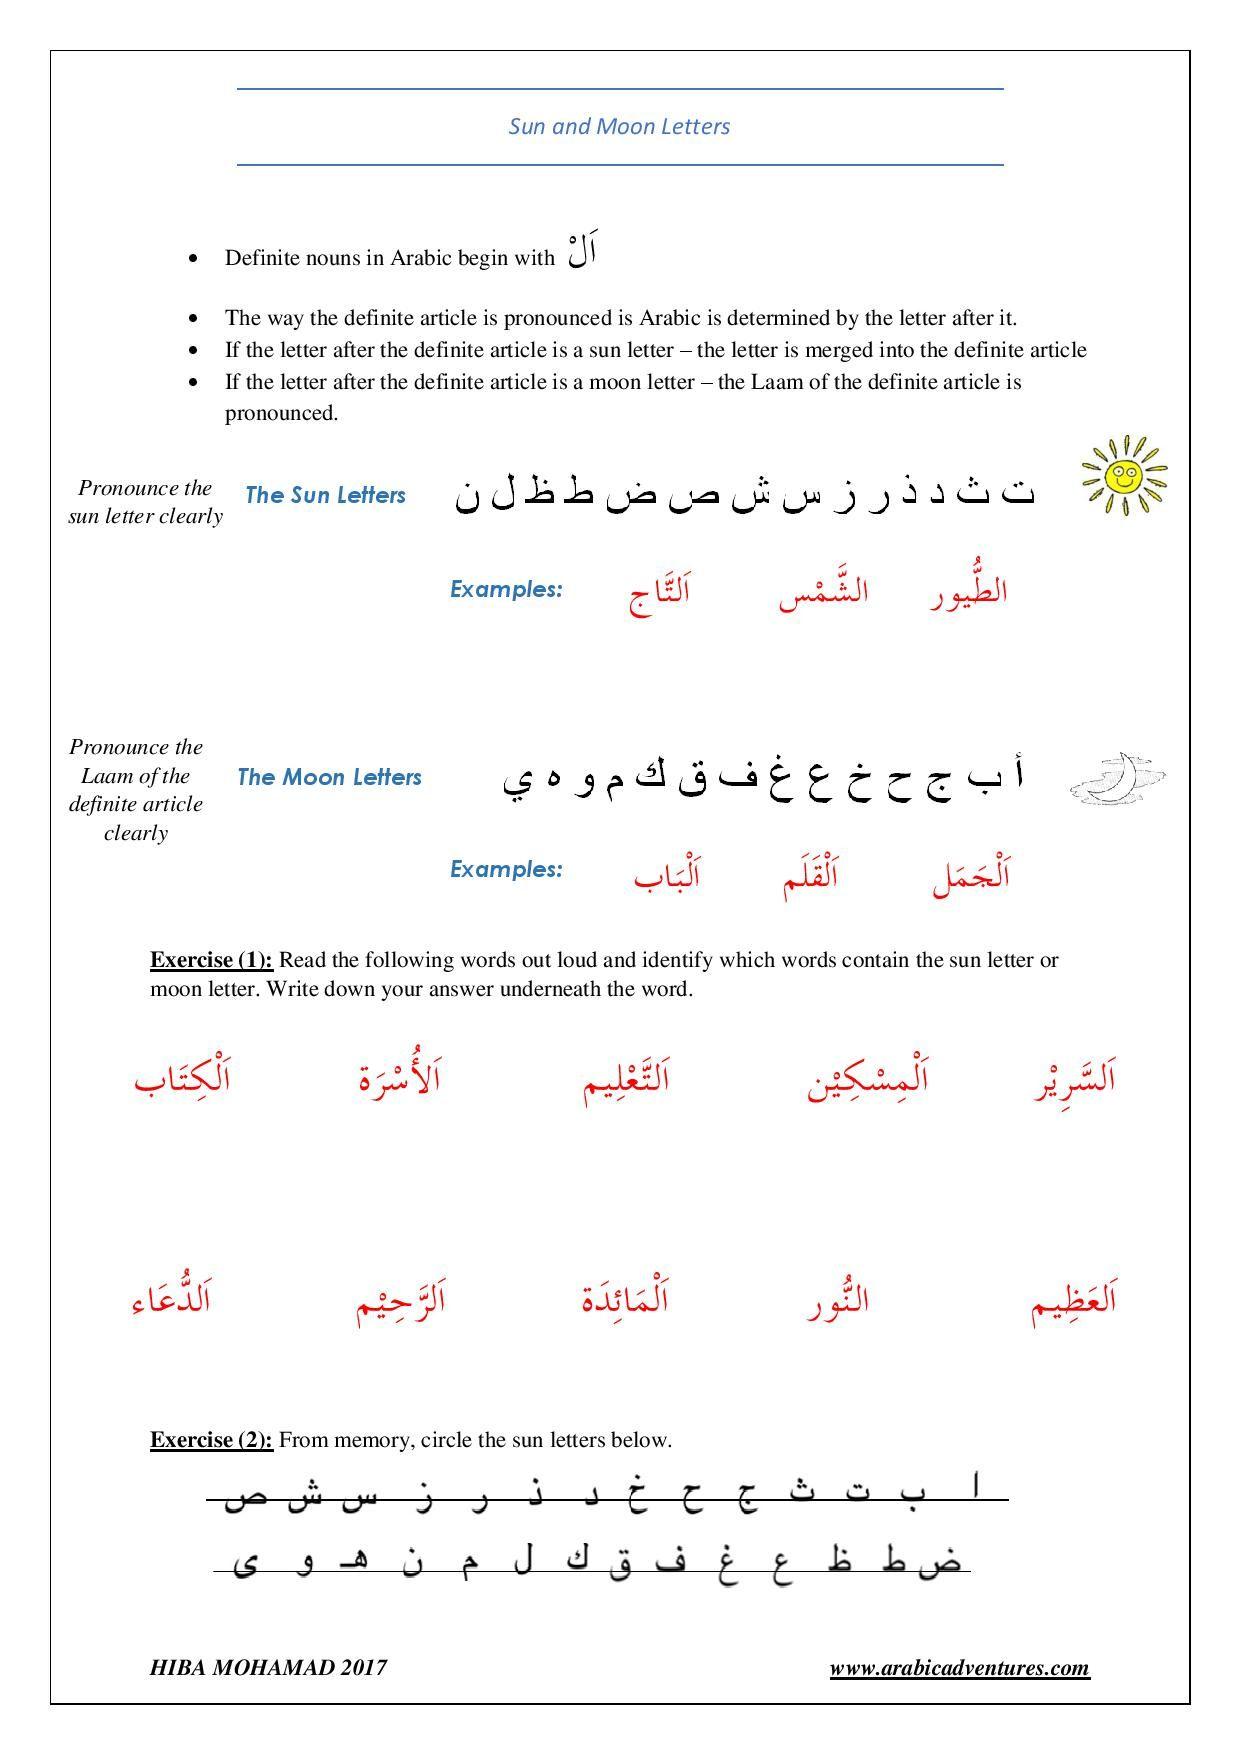 hight resolution of Learning Arabic MSA (#FabienneM) Sun and Moon letters in Arabic worksheet  www.arabicadventures.com   Learning arabic